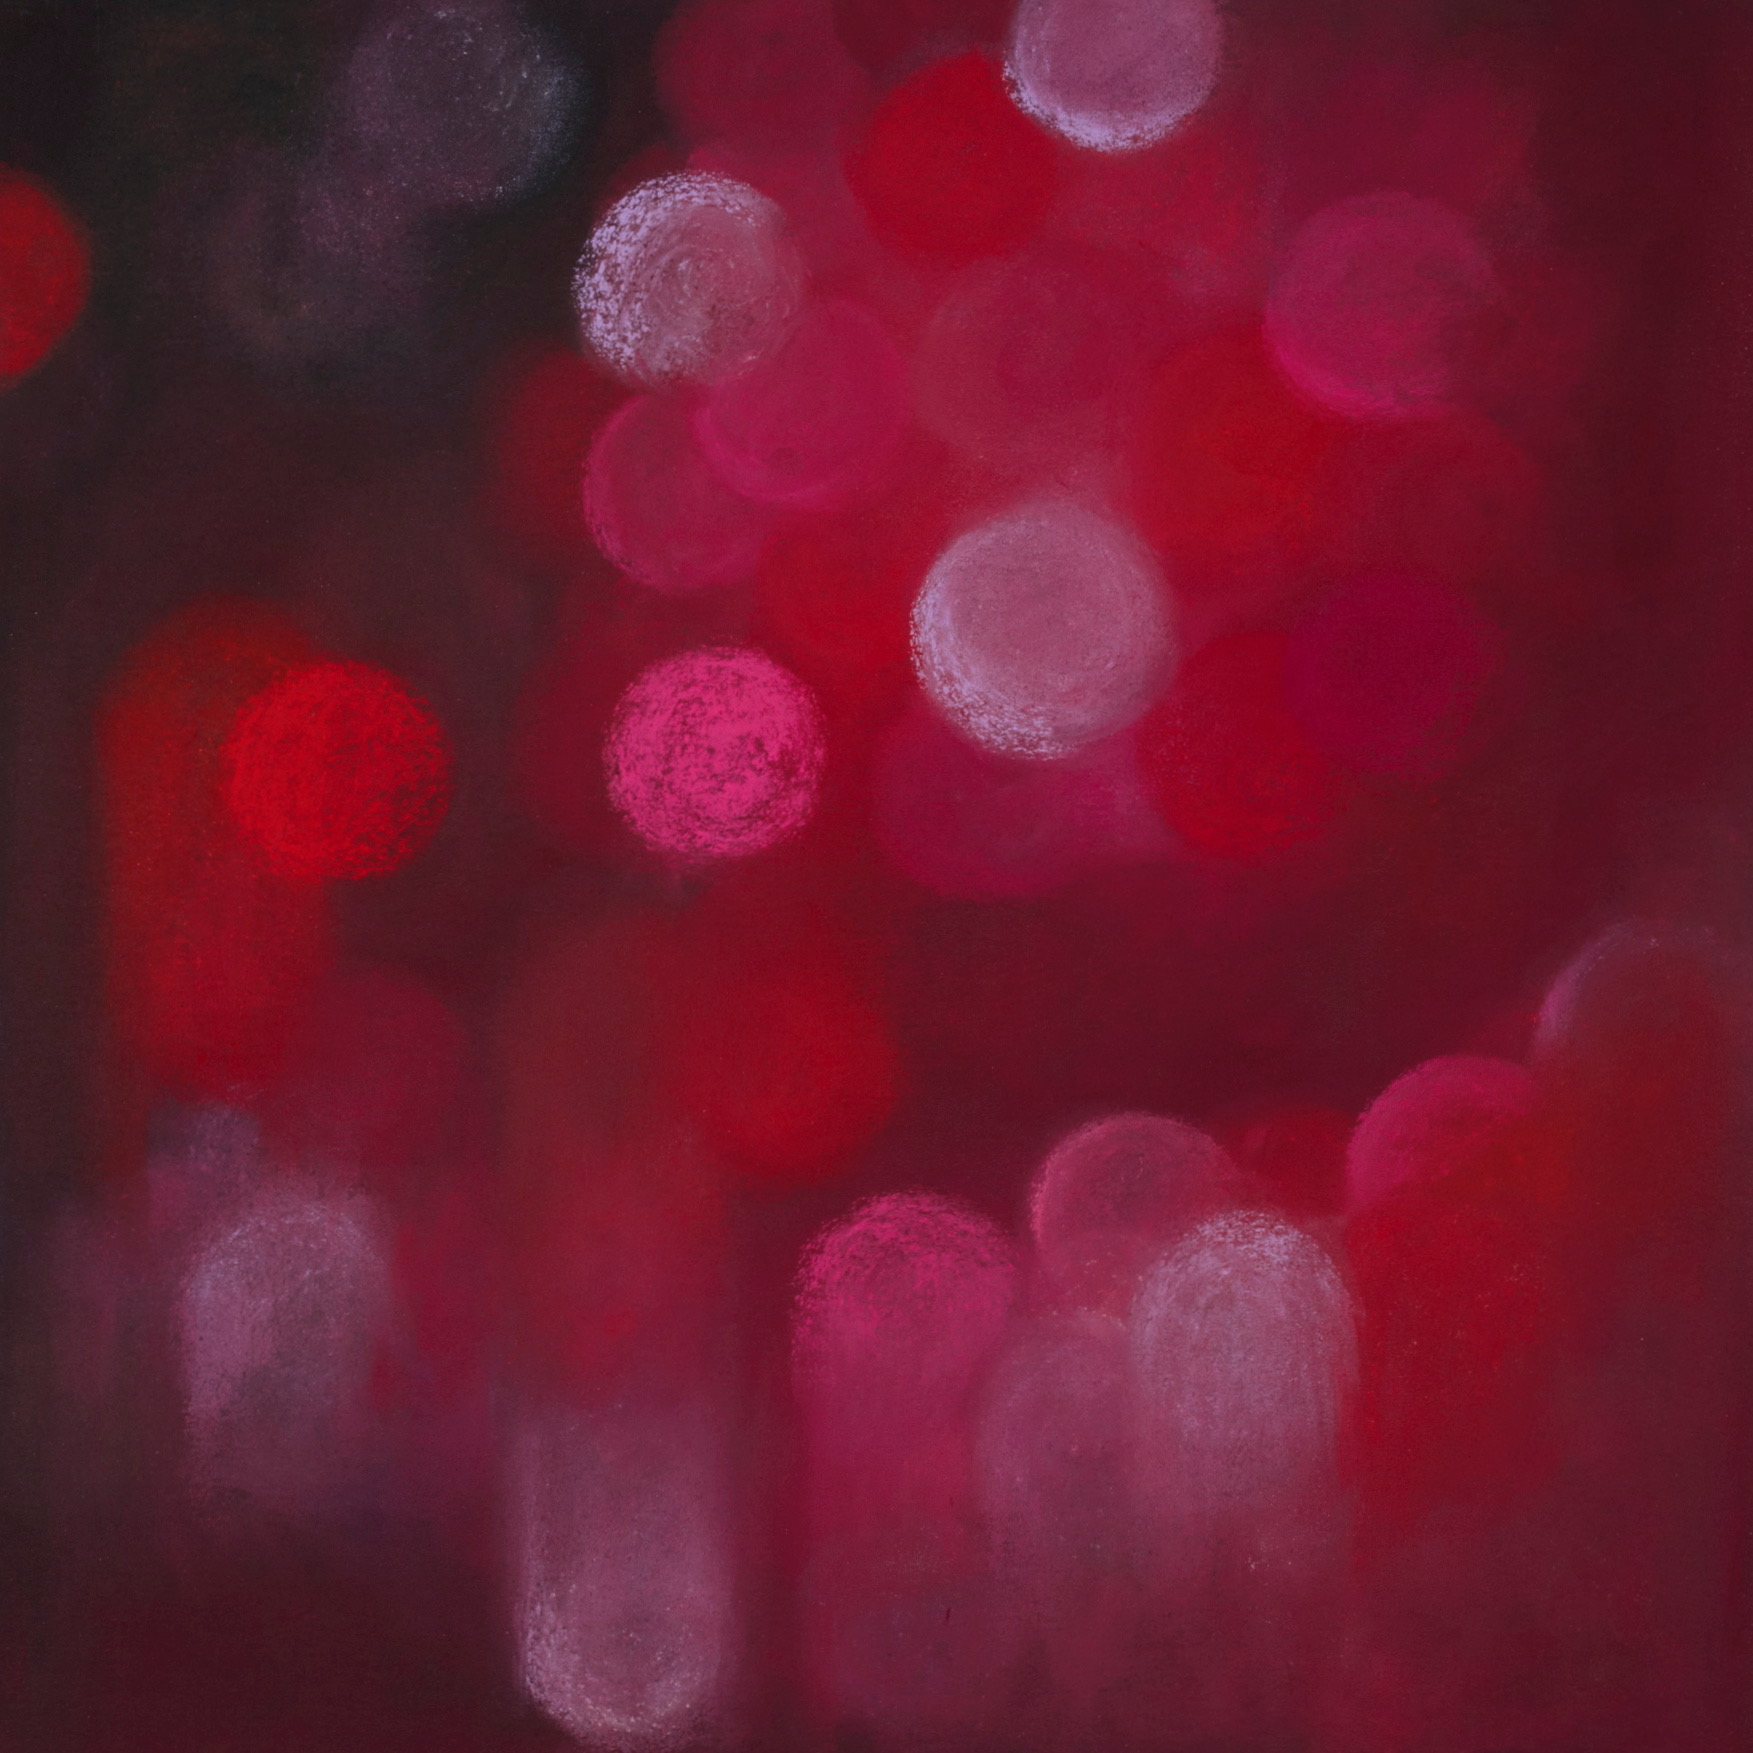 Cerise glow, 2009, pastel on paper, 40.5x 40.5cm